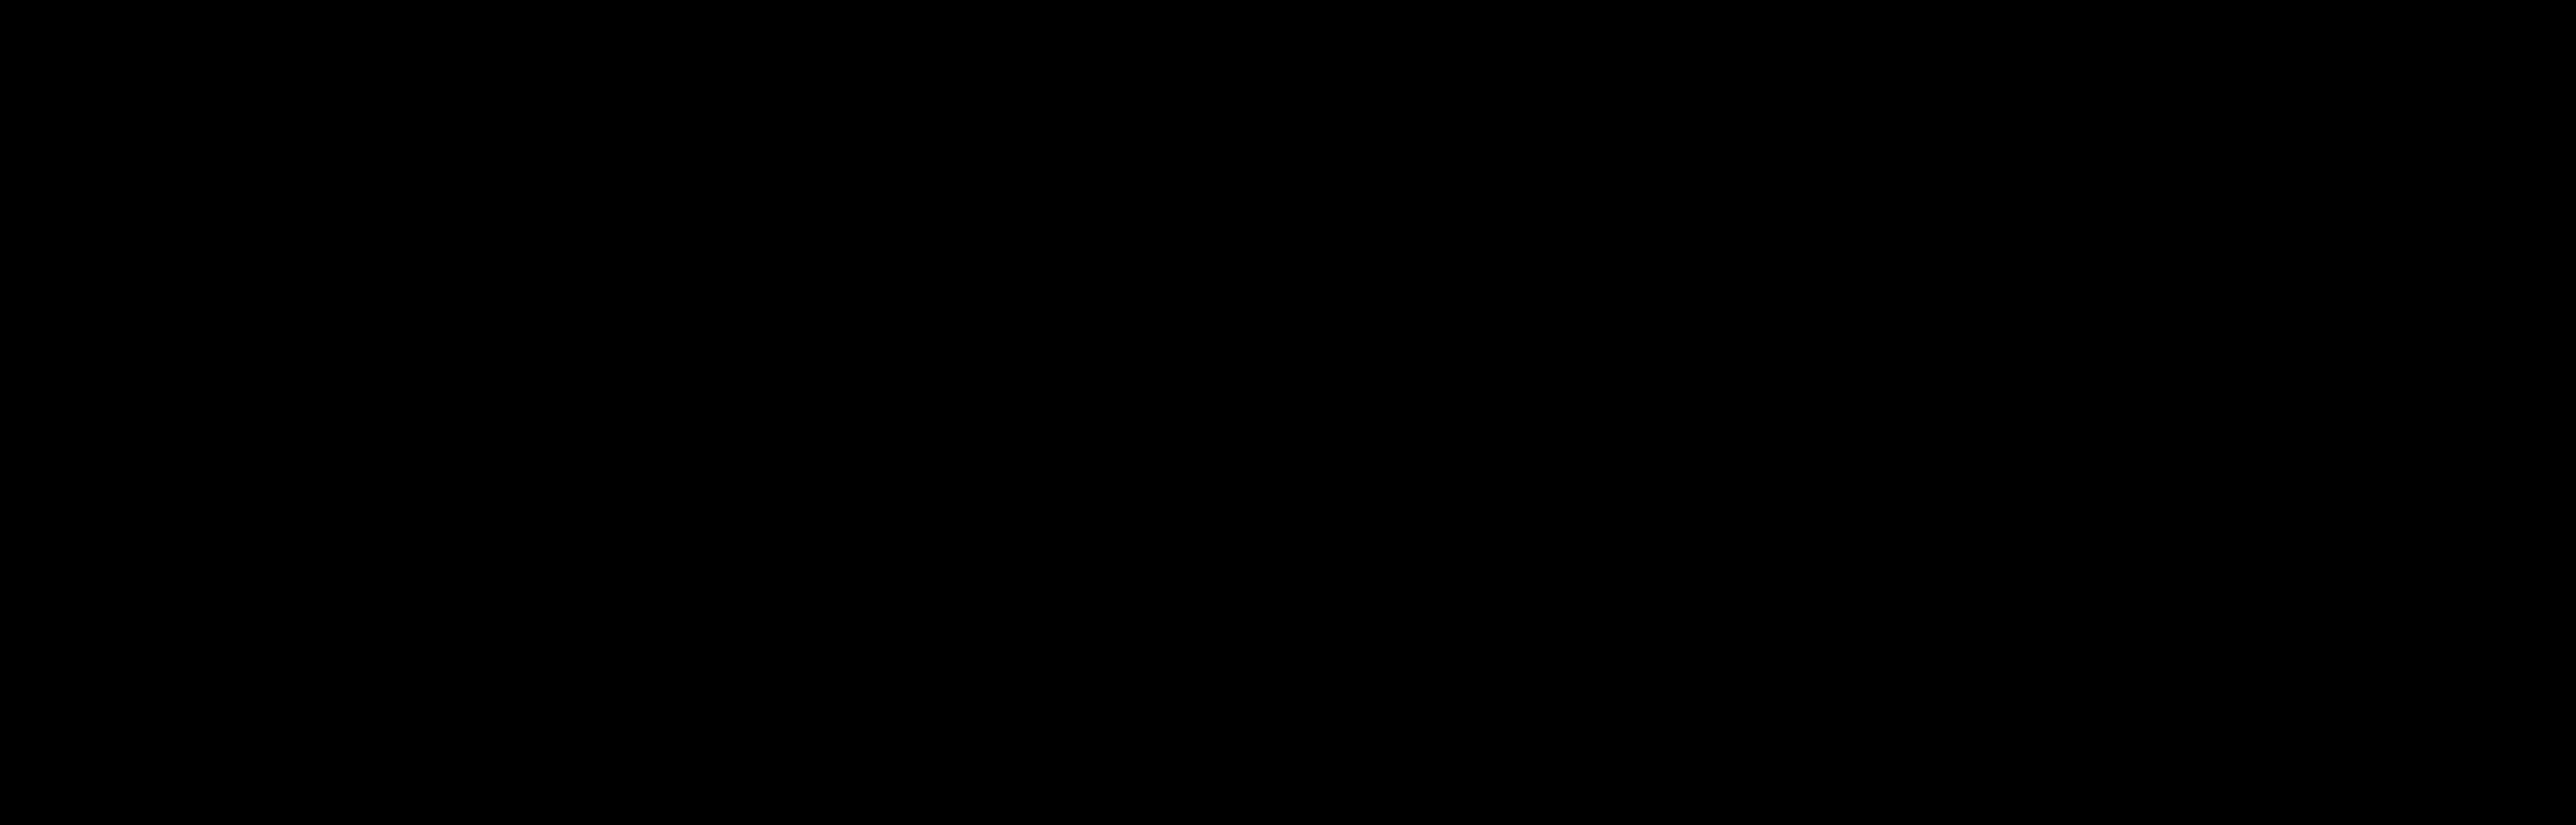 Fabric Genomics logo